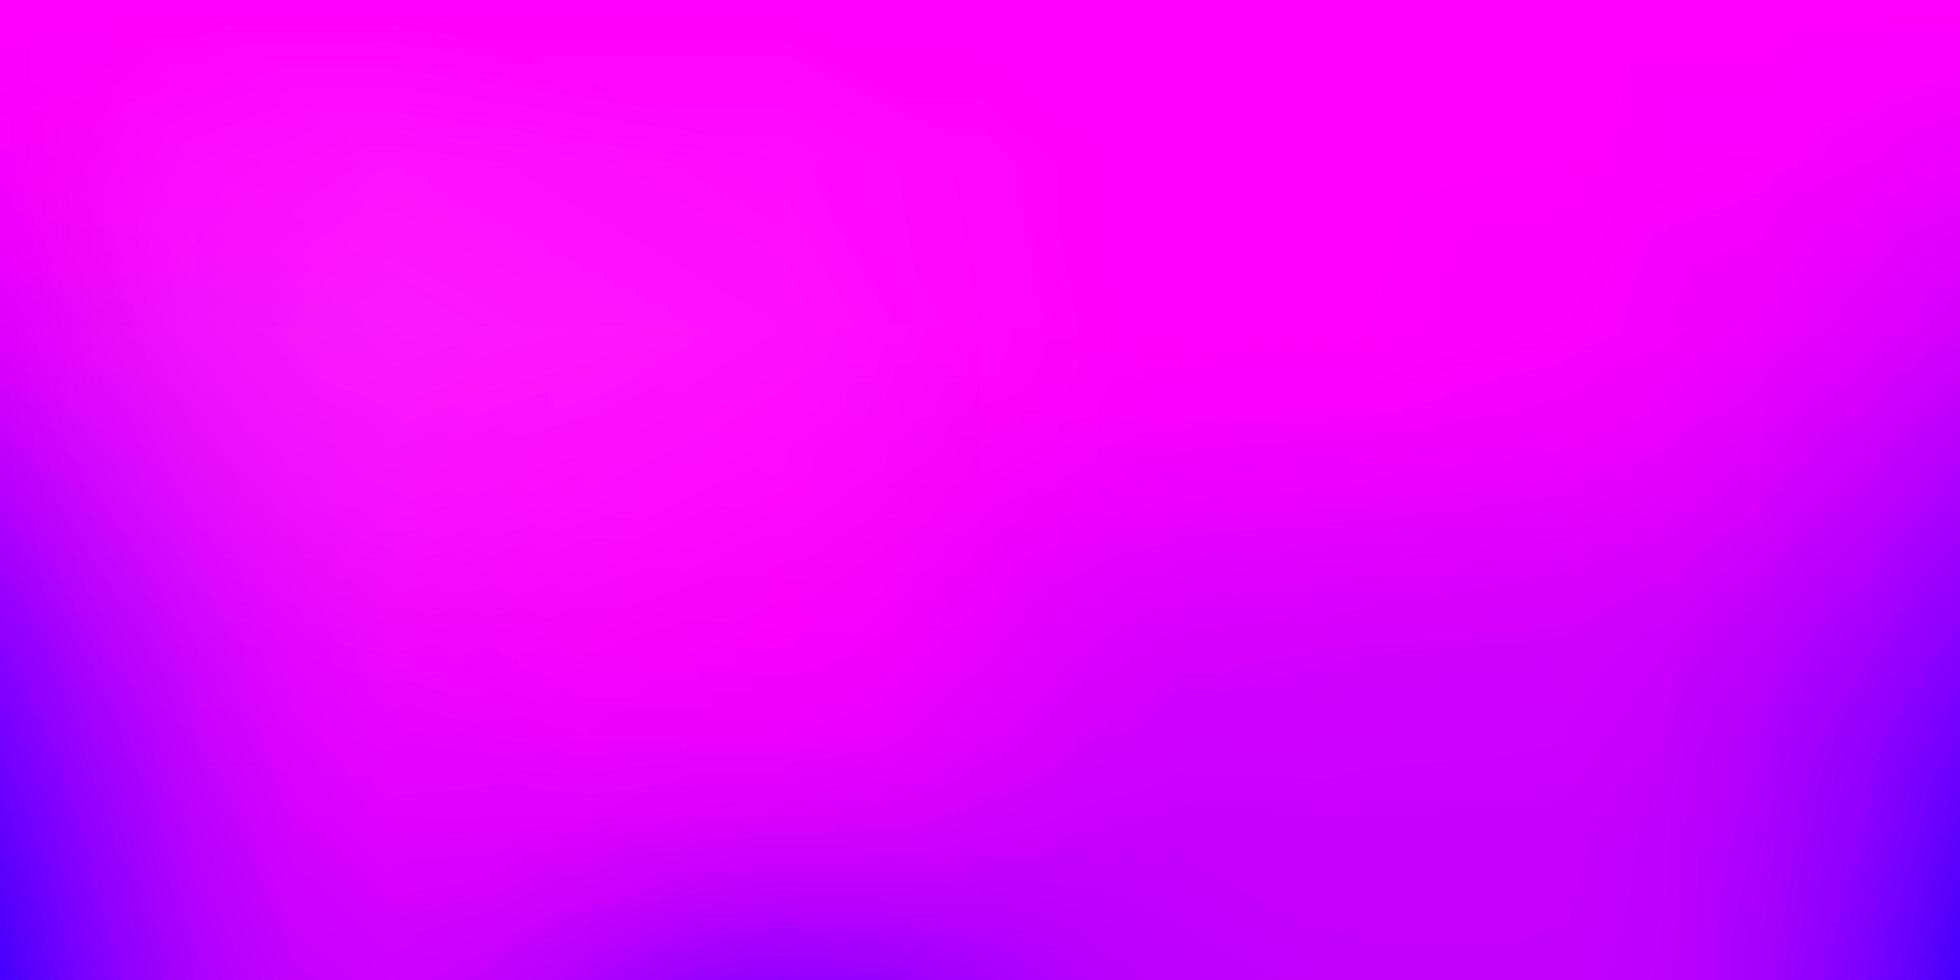 sfondo sfocato sfumato vettoriale viola chiaro, rosa.